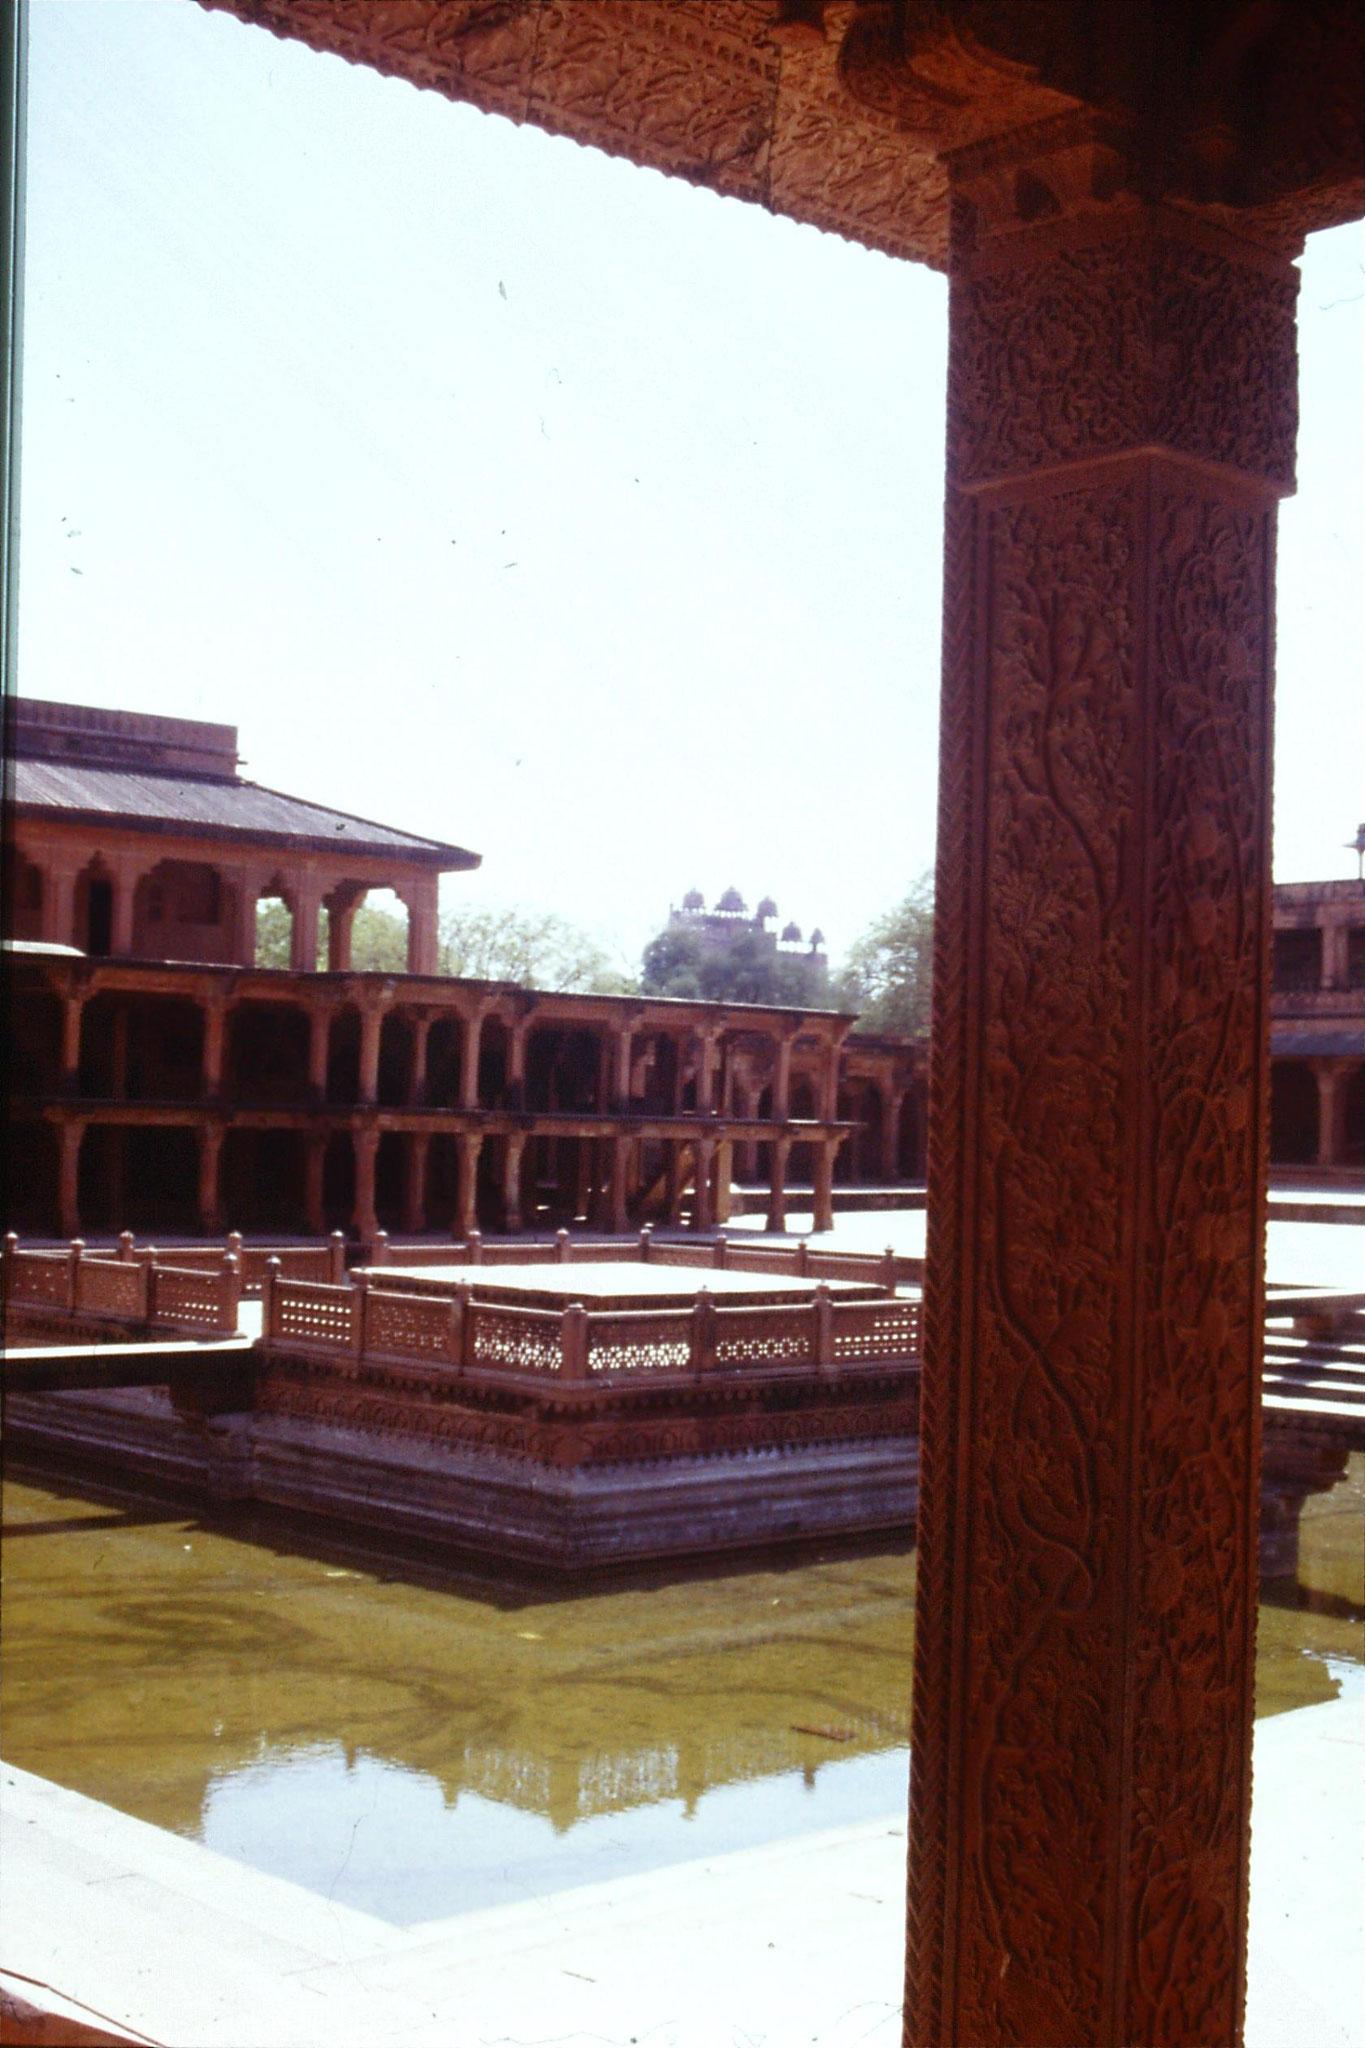 109/12: 31/3/1990 Fatehpur Sikri - looking at Turkish Sutan's house